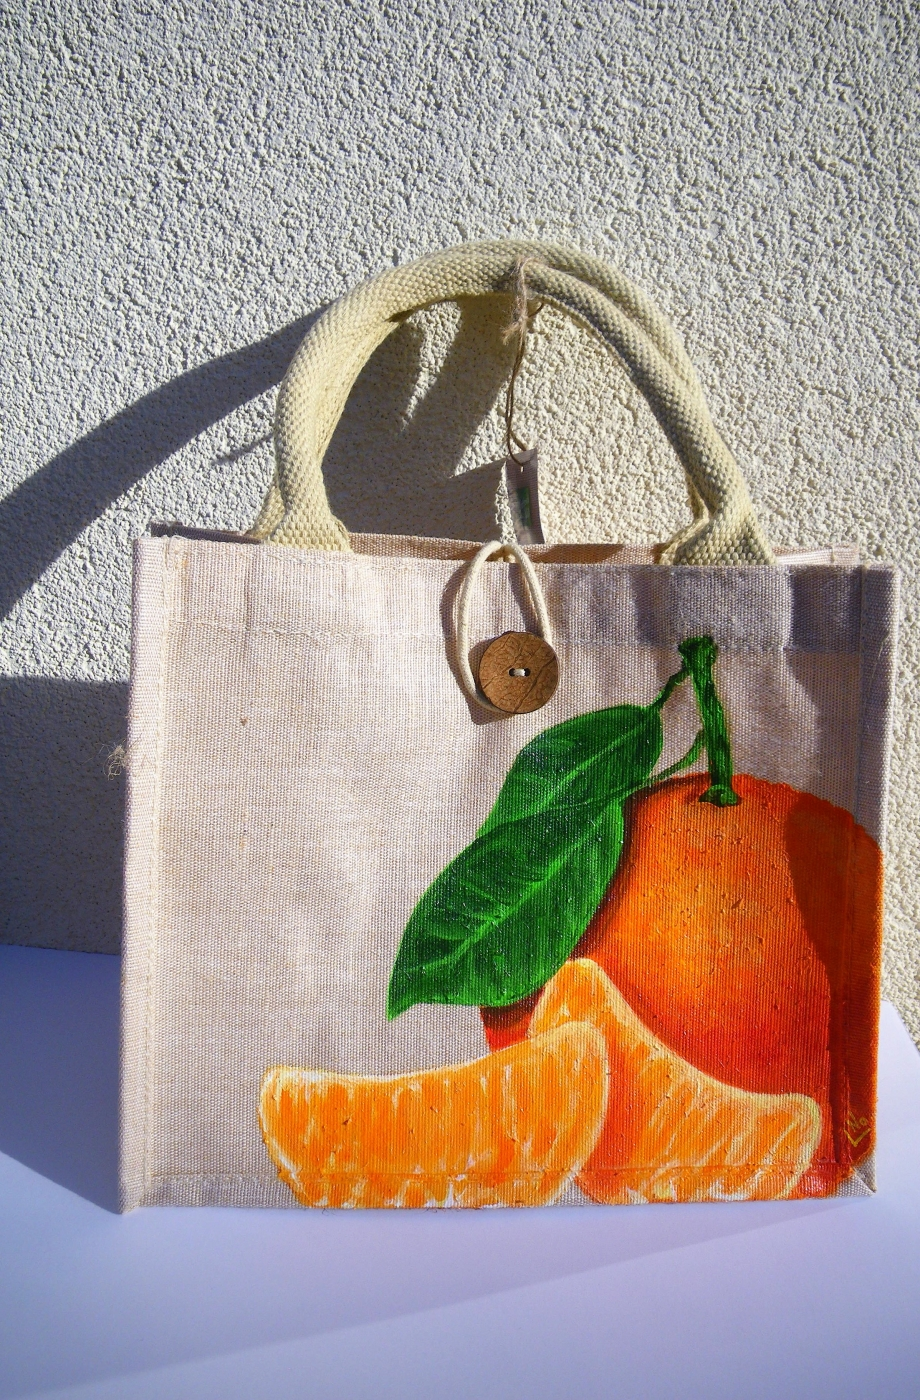 sac-jute-bouton-clementine.JPG